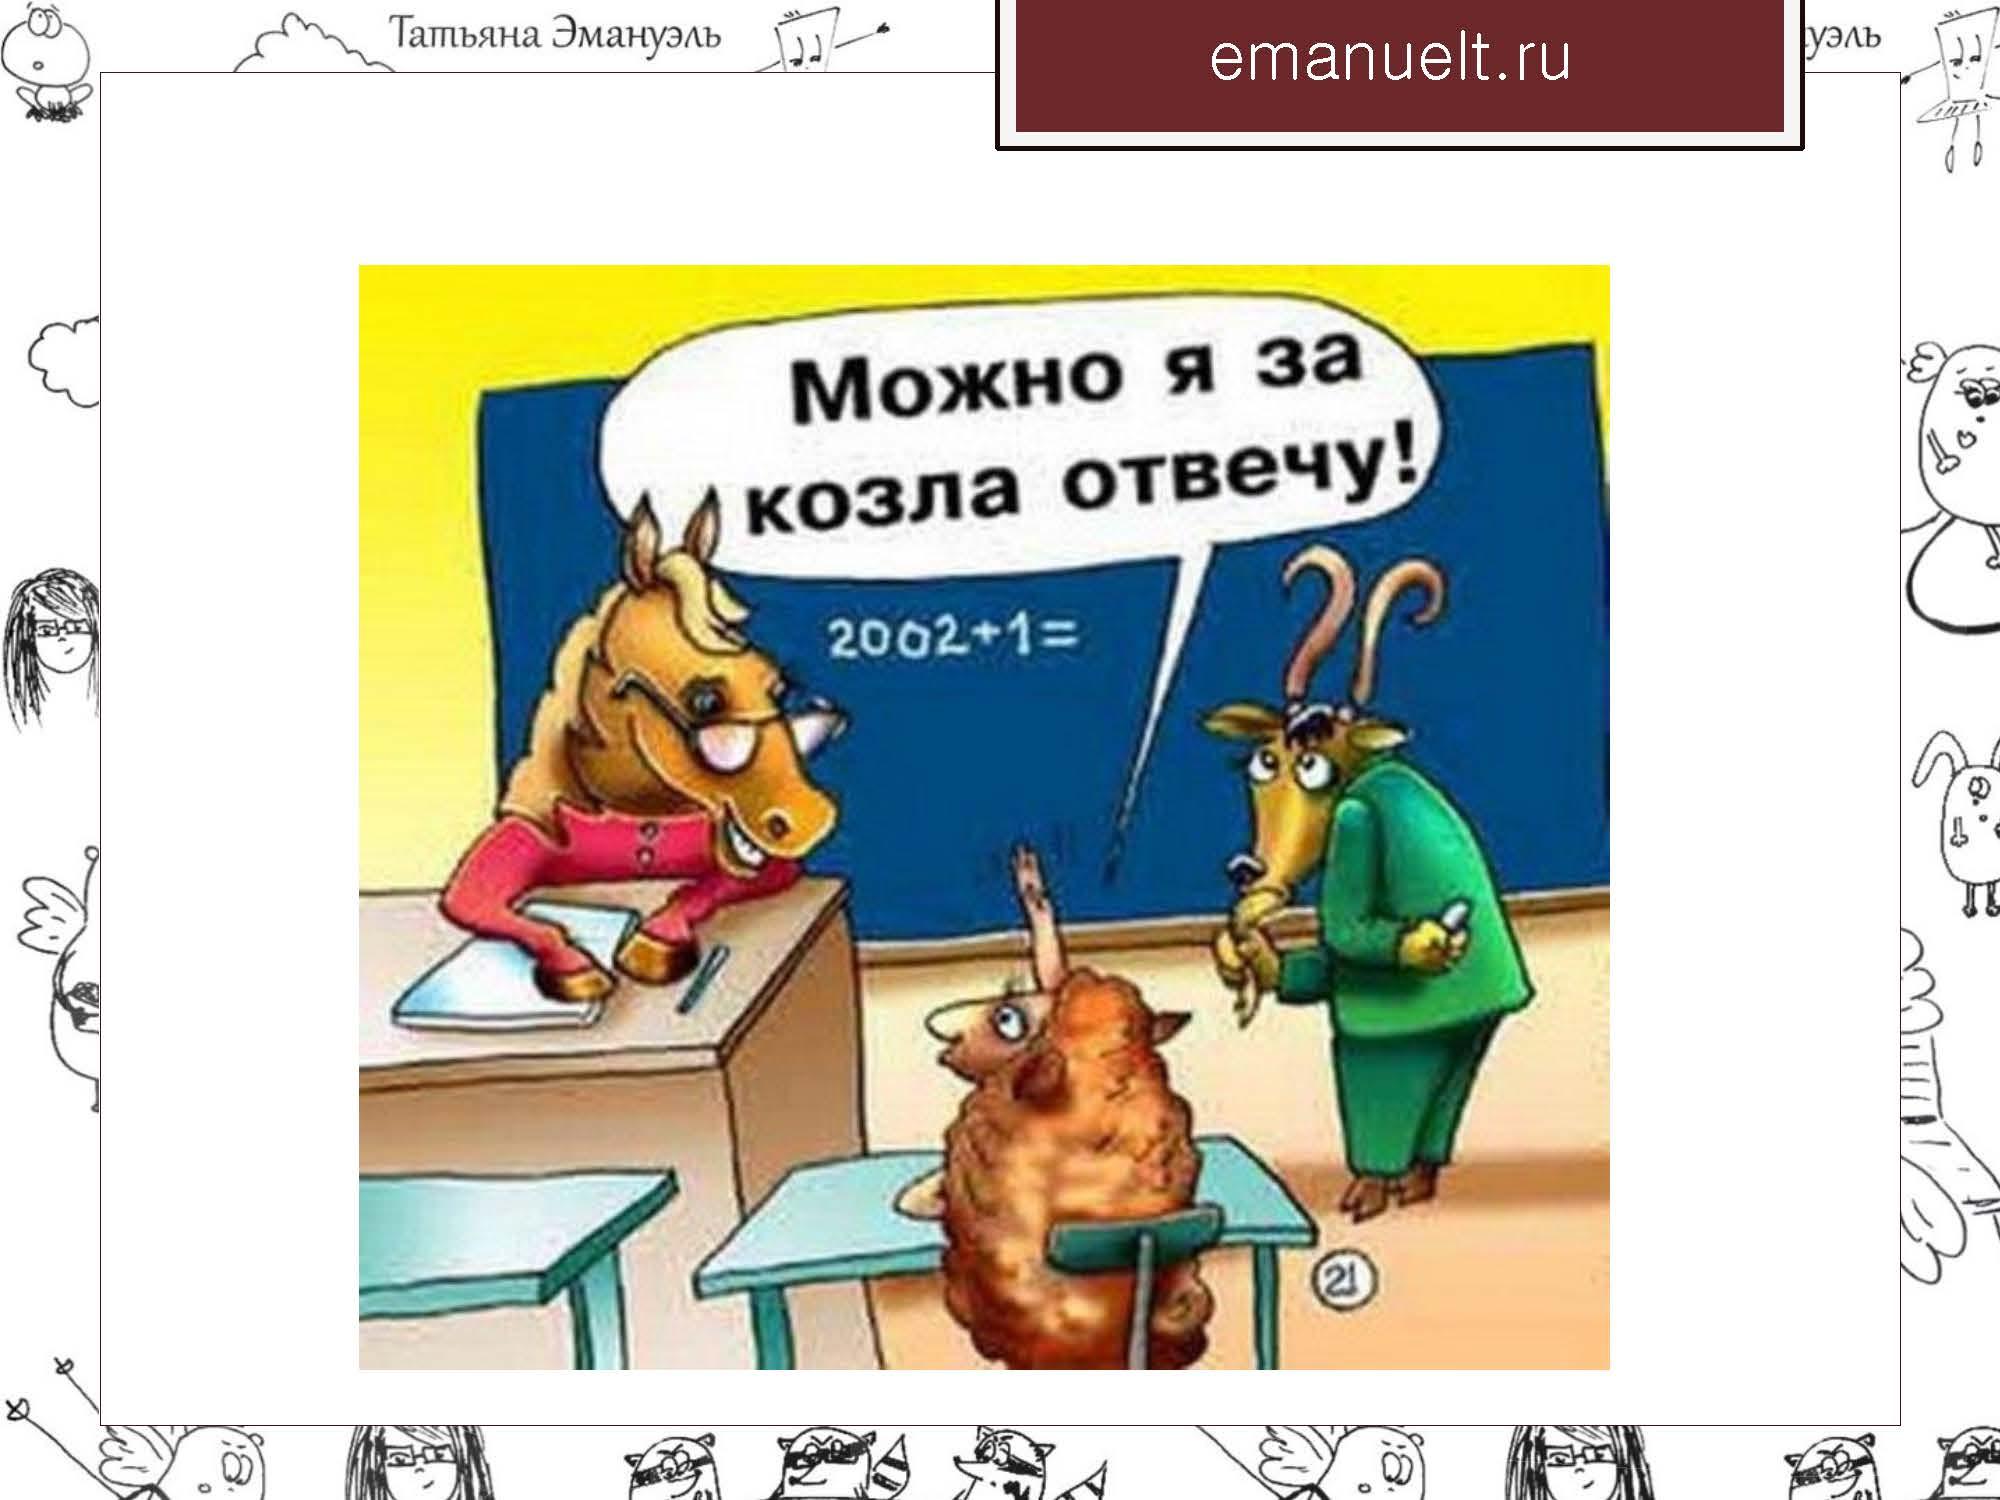 06 февраля эмануэль_Страница_112